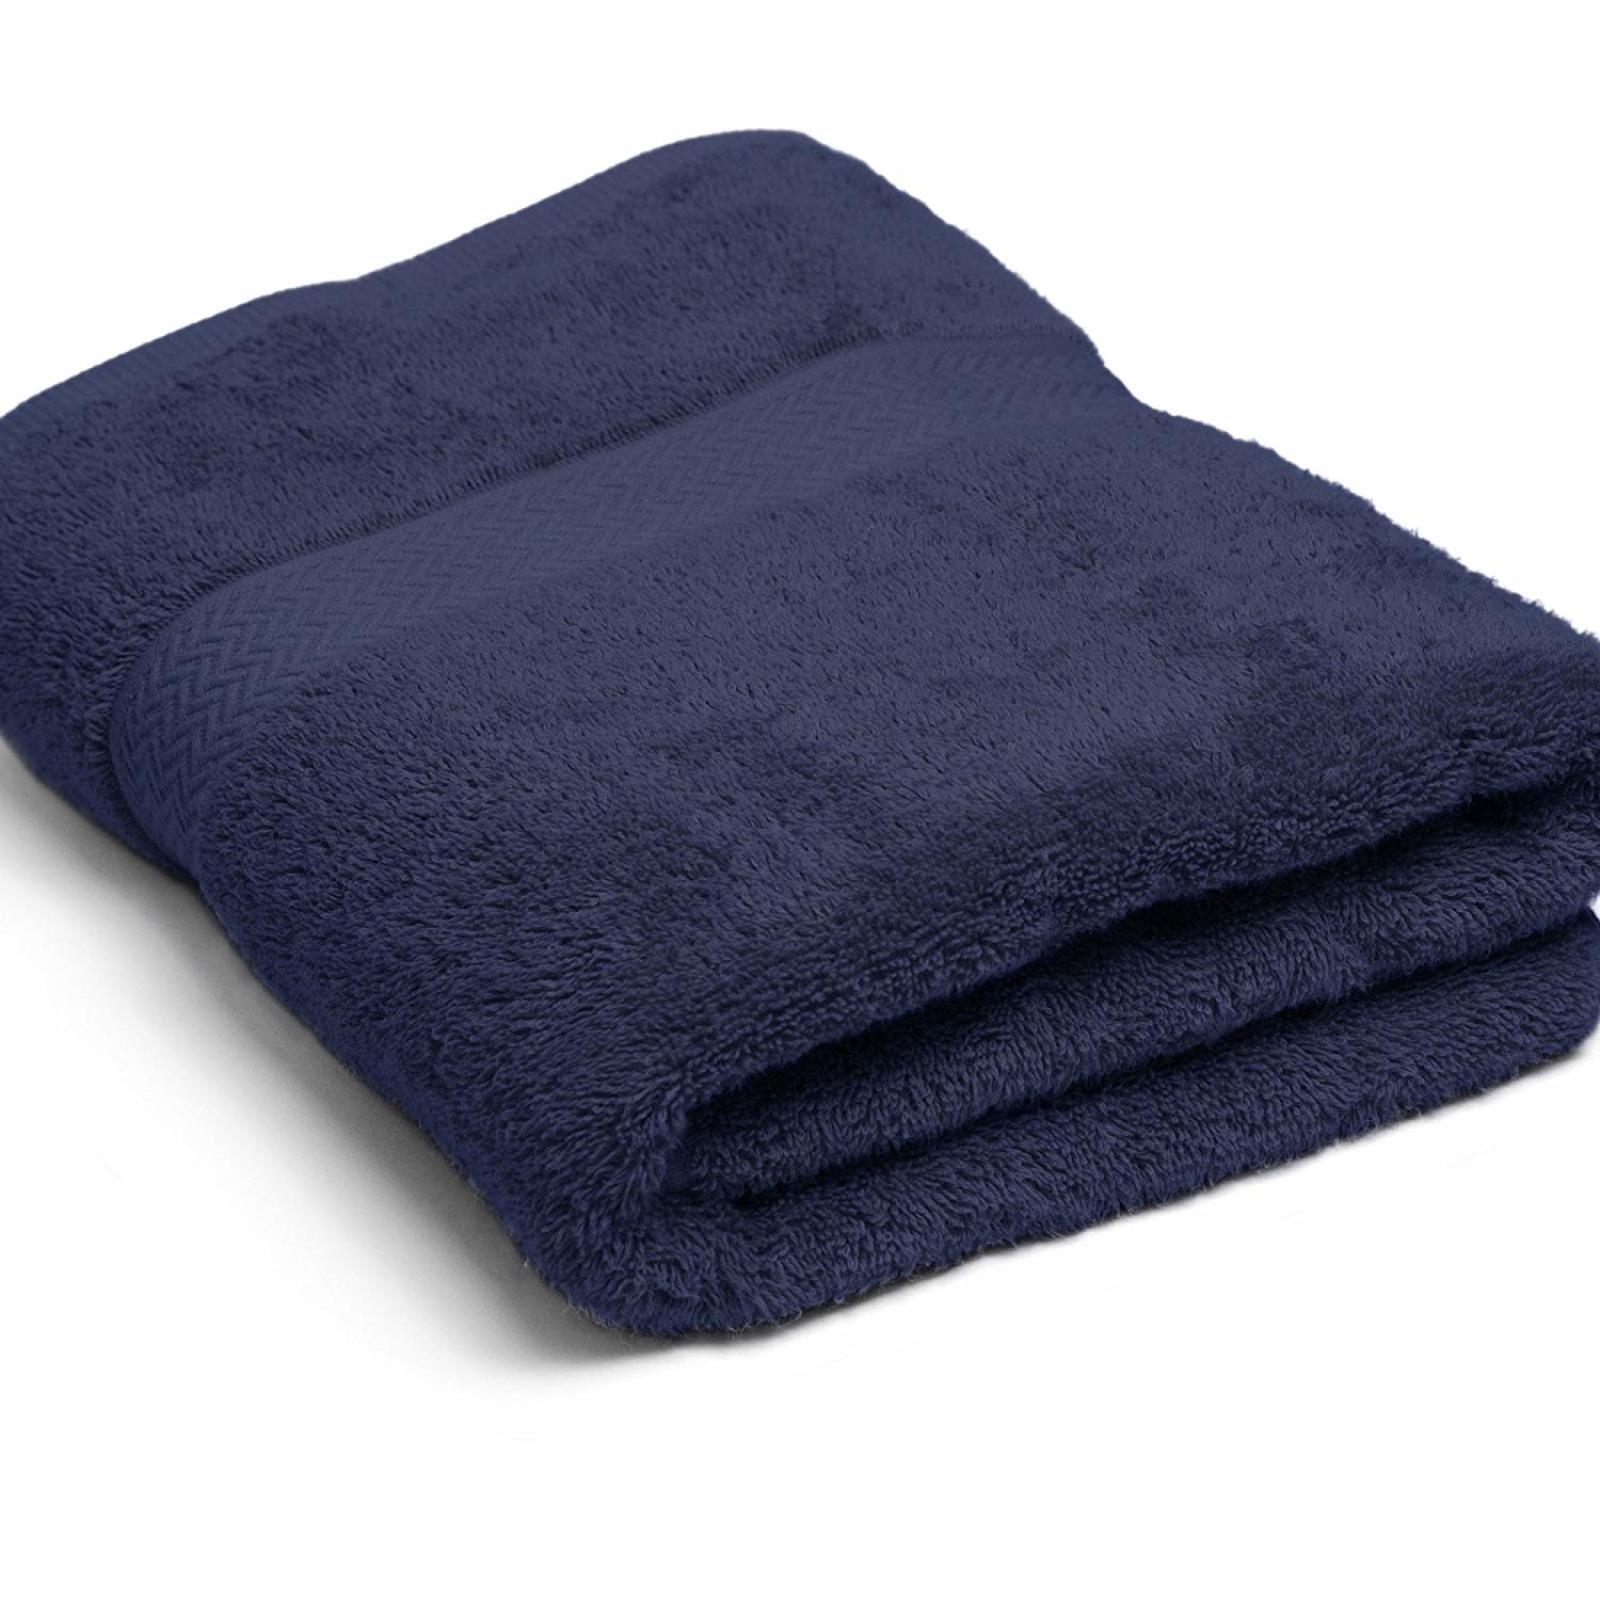 COMMERCIAL PREMIUM 6 PIECE BATH TOWEL SET  Navy Home Business Gym Pool Absorbent